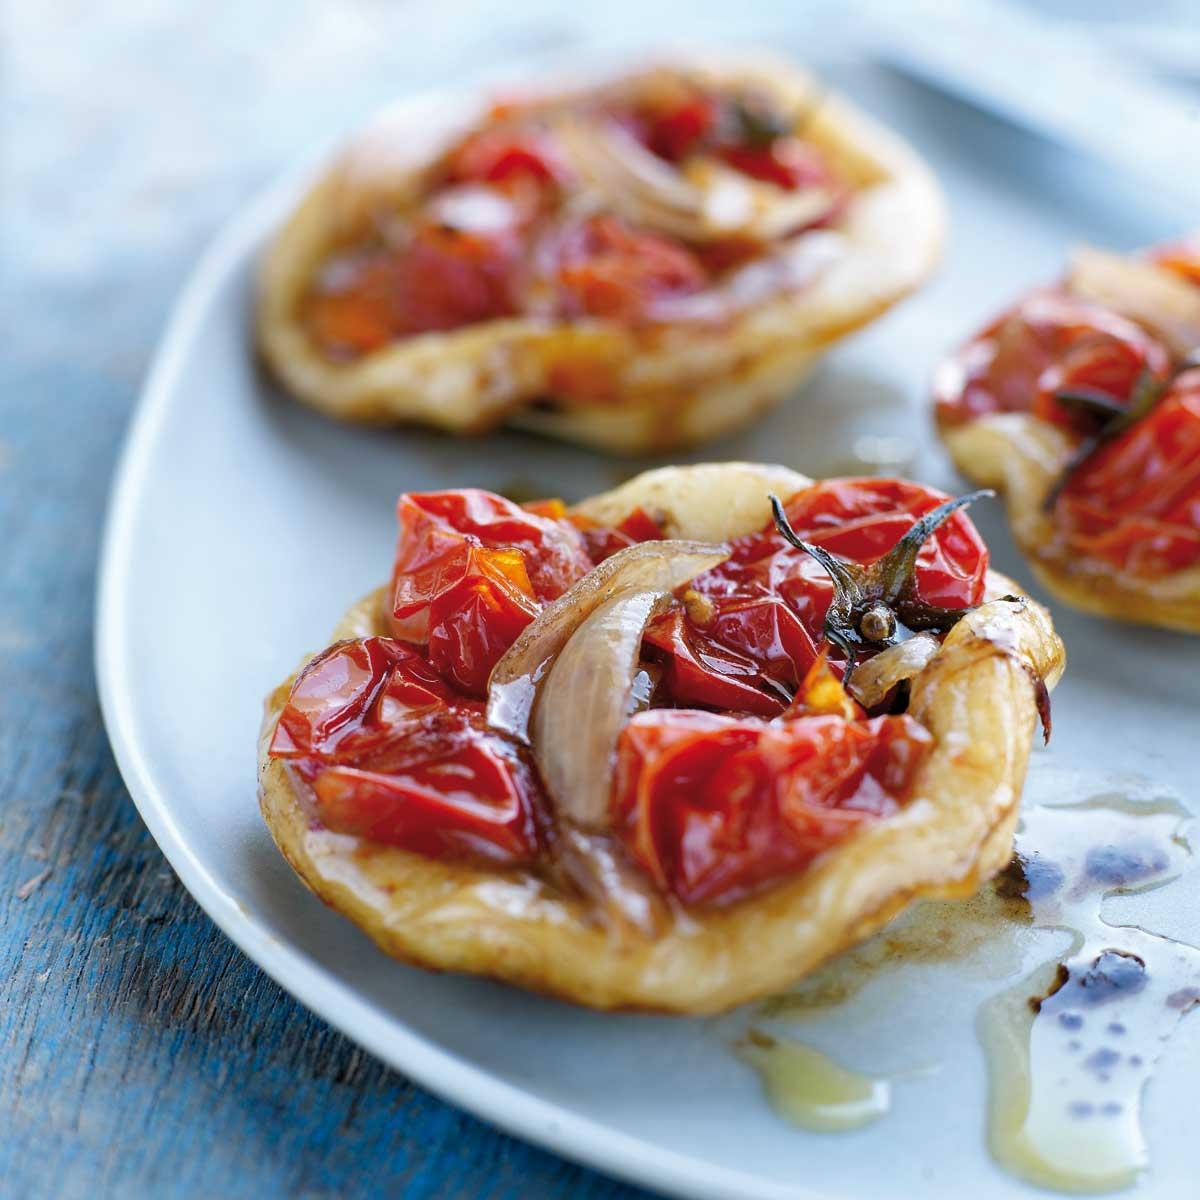 recette mini pizzas aux tomates cerises cuisine madame figaro. Black Bedroom Furniture Sets. Home Design Ideas